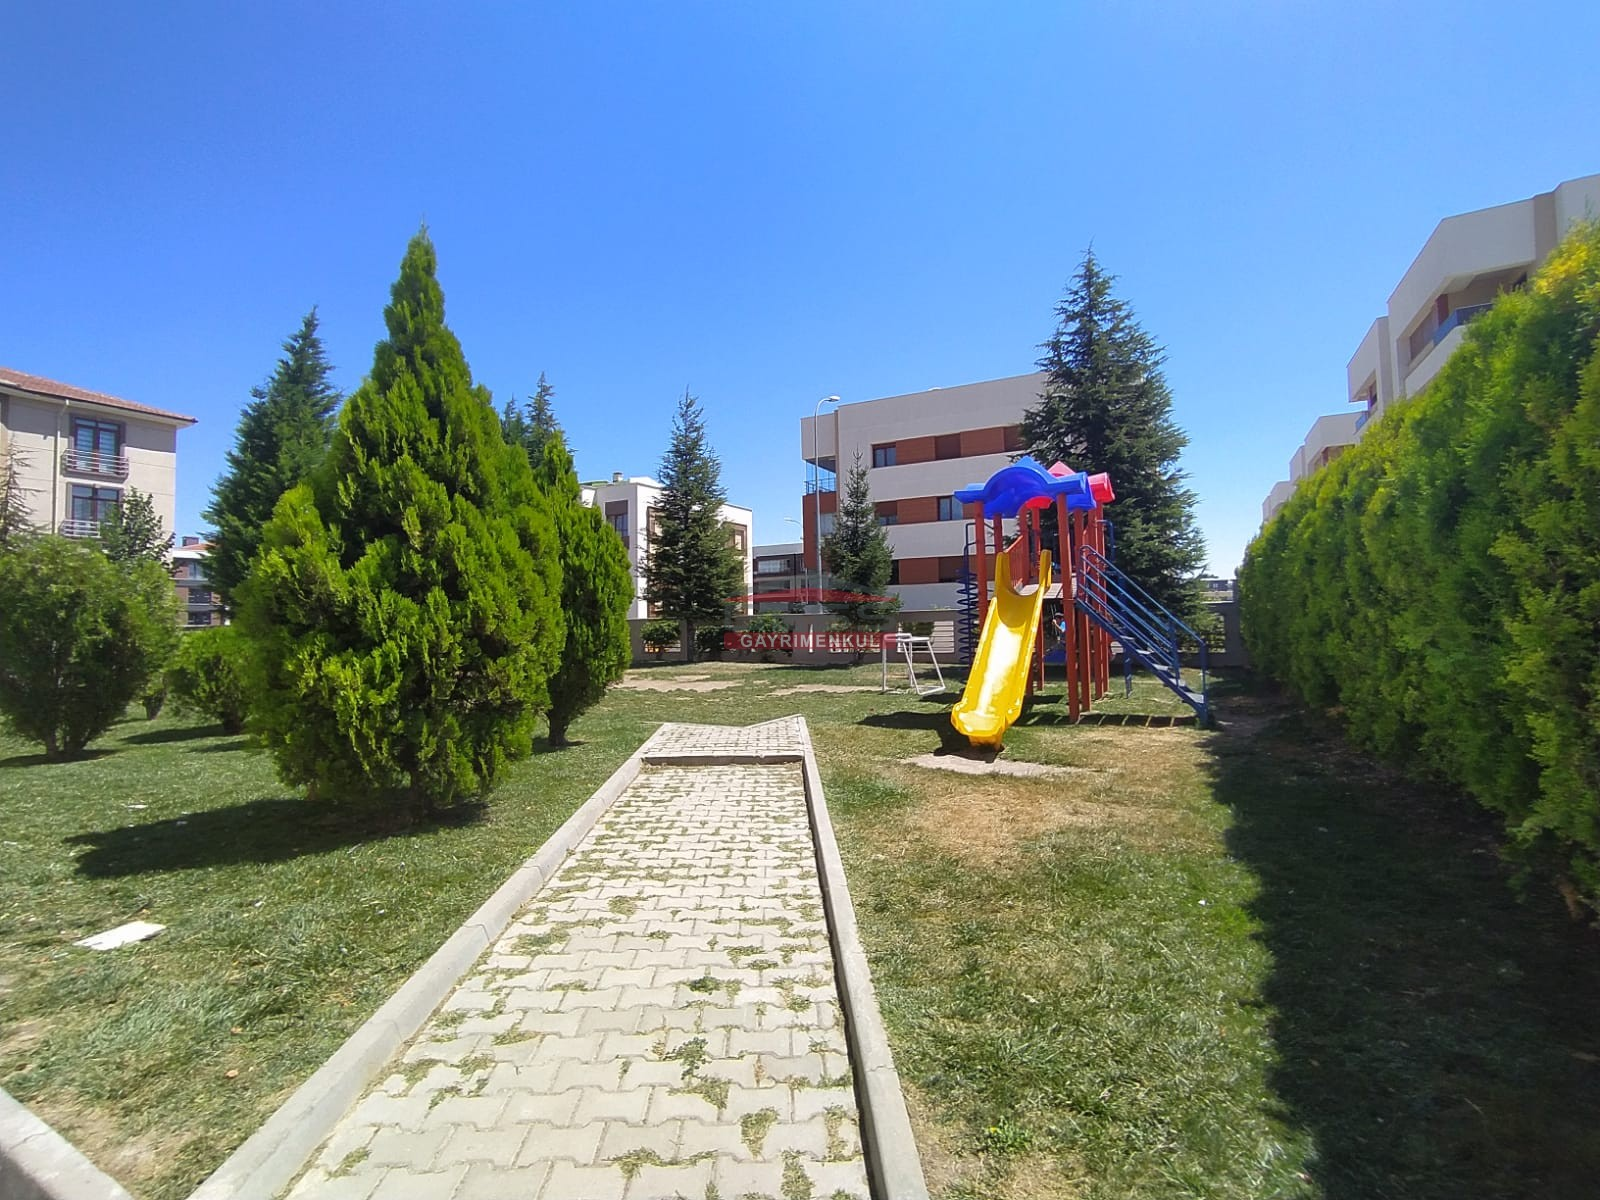 Bess   BESS'DEN BATIKENT PELİT EVLERİ SİTESİNDE HAVUZLU 4+1 DAİRE